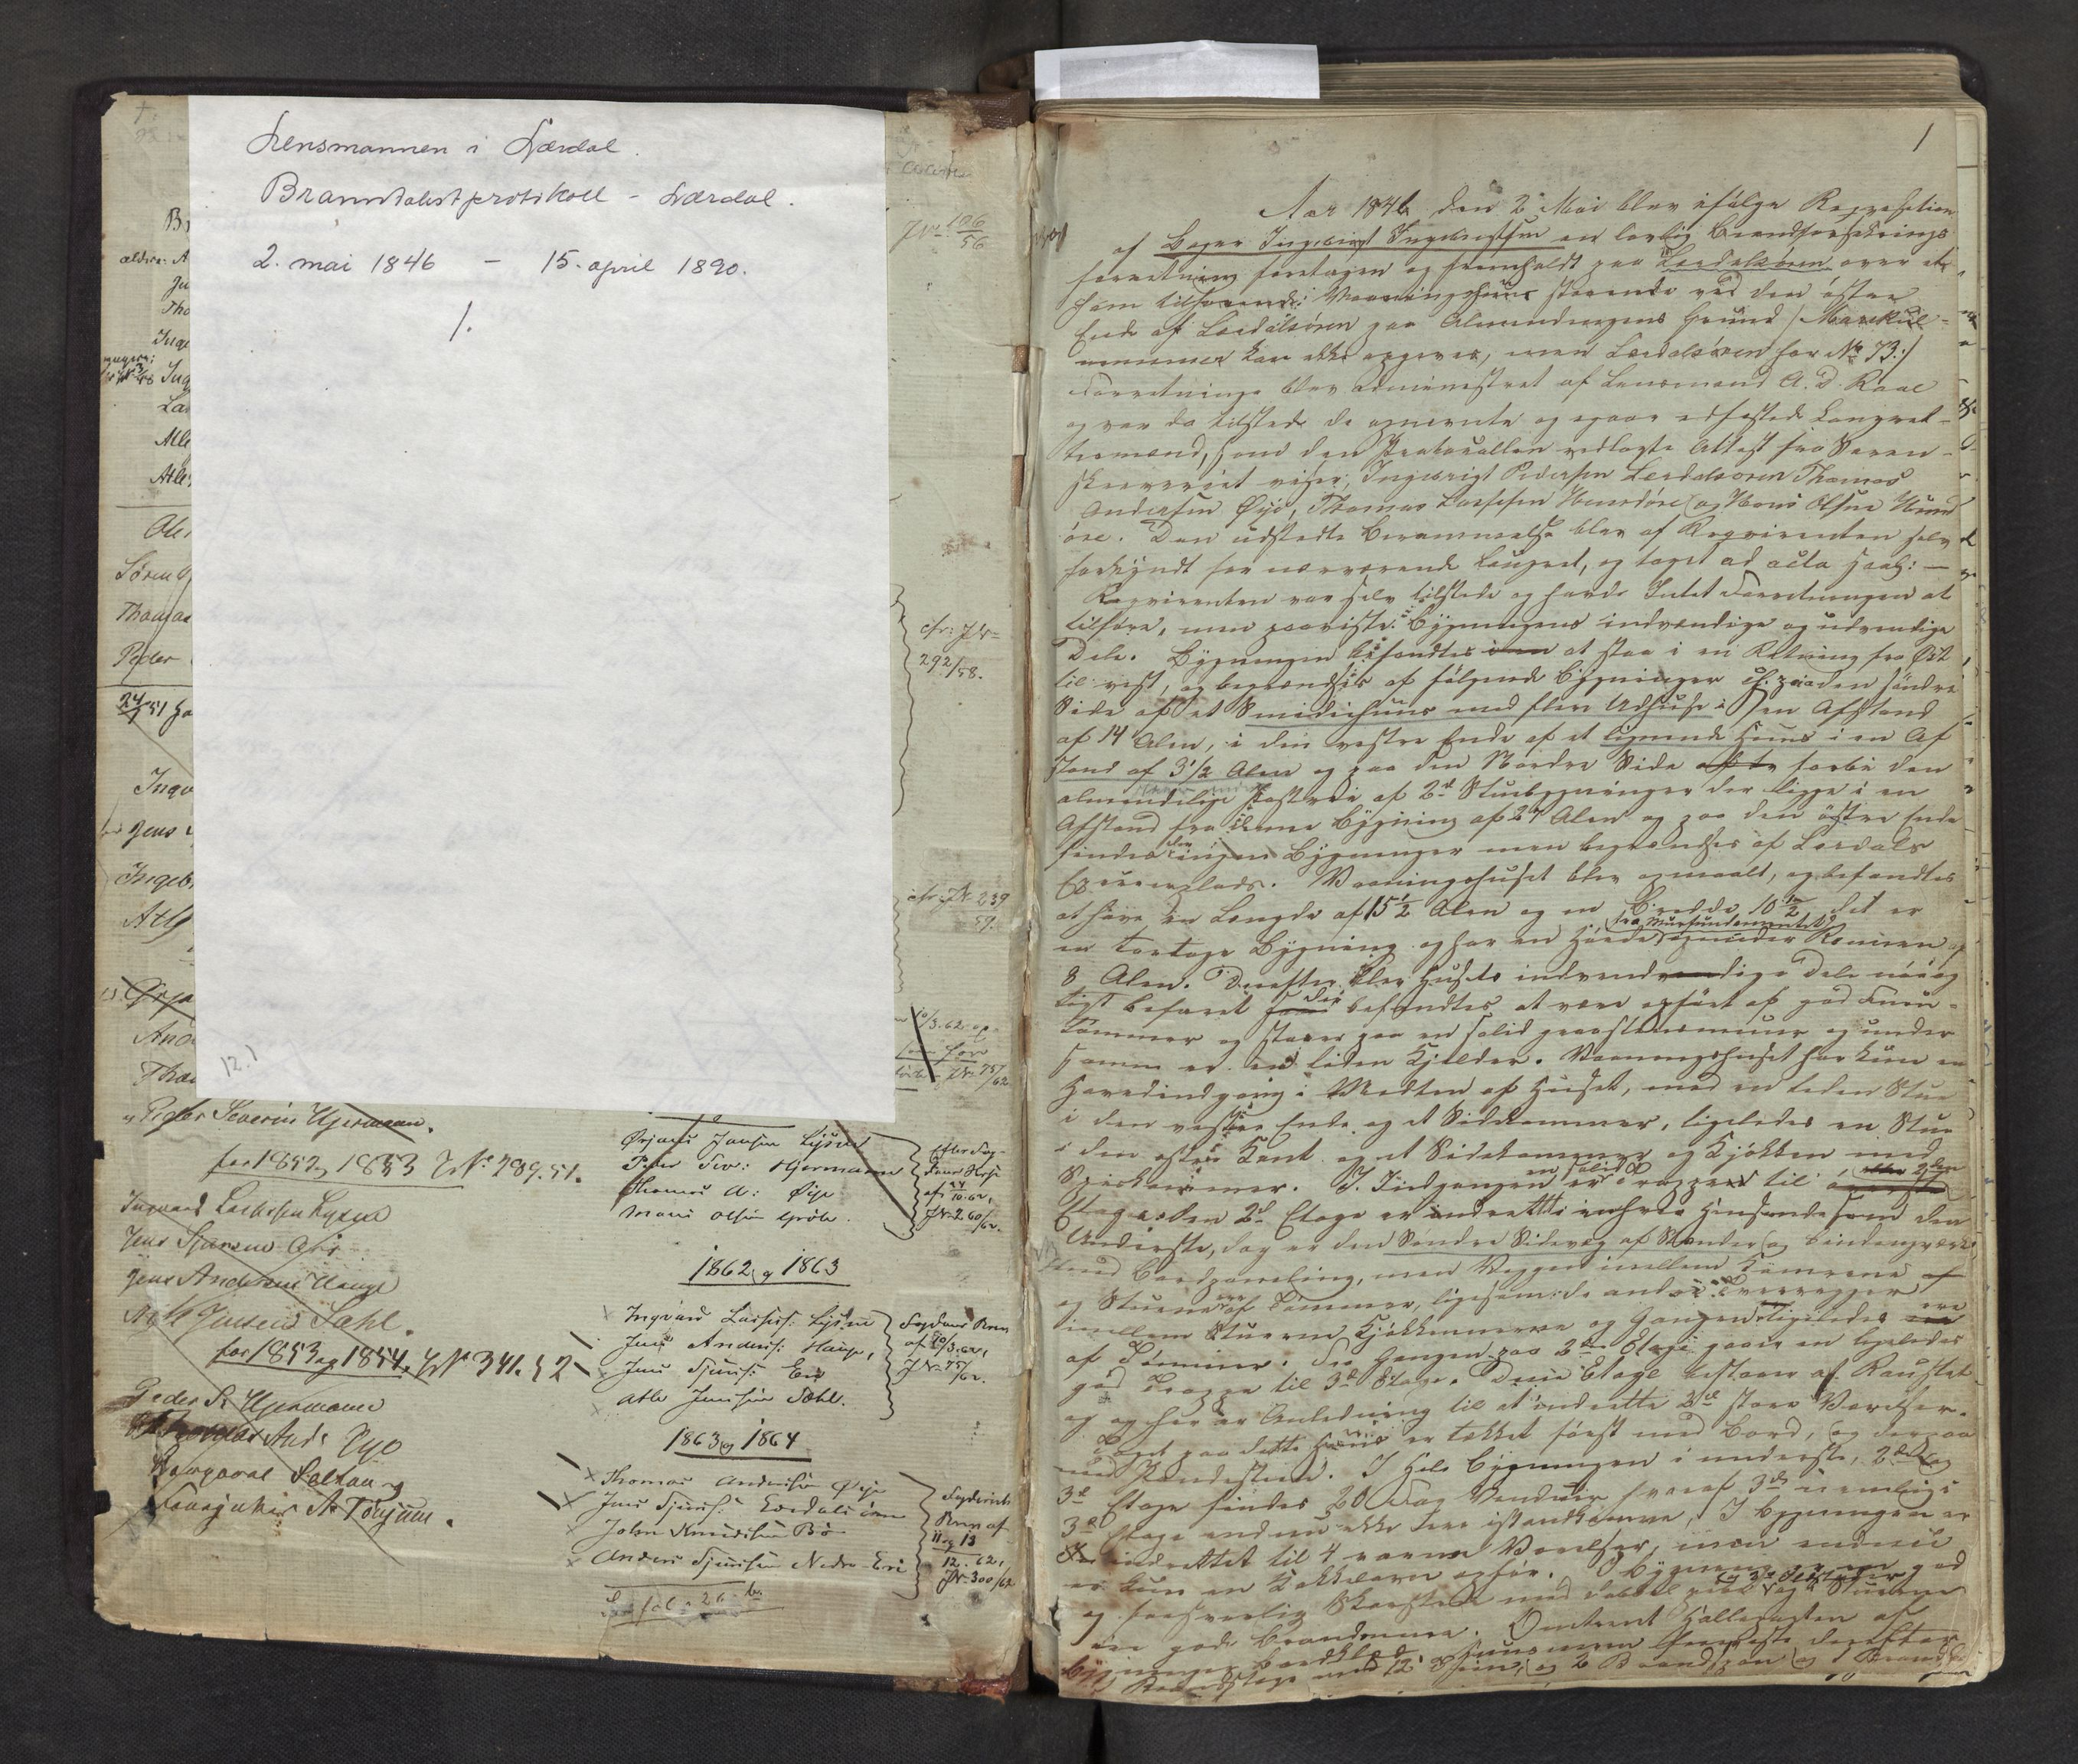 SAB, Lensmannen i Lærdal, 0012/L0001: Branntakstprotokoll, 1846-1890, s. 1a